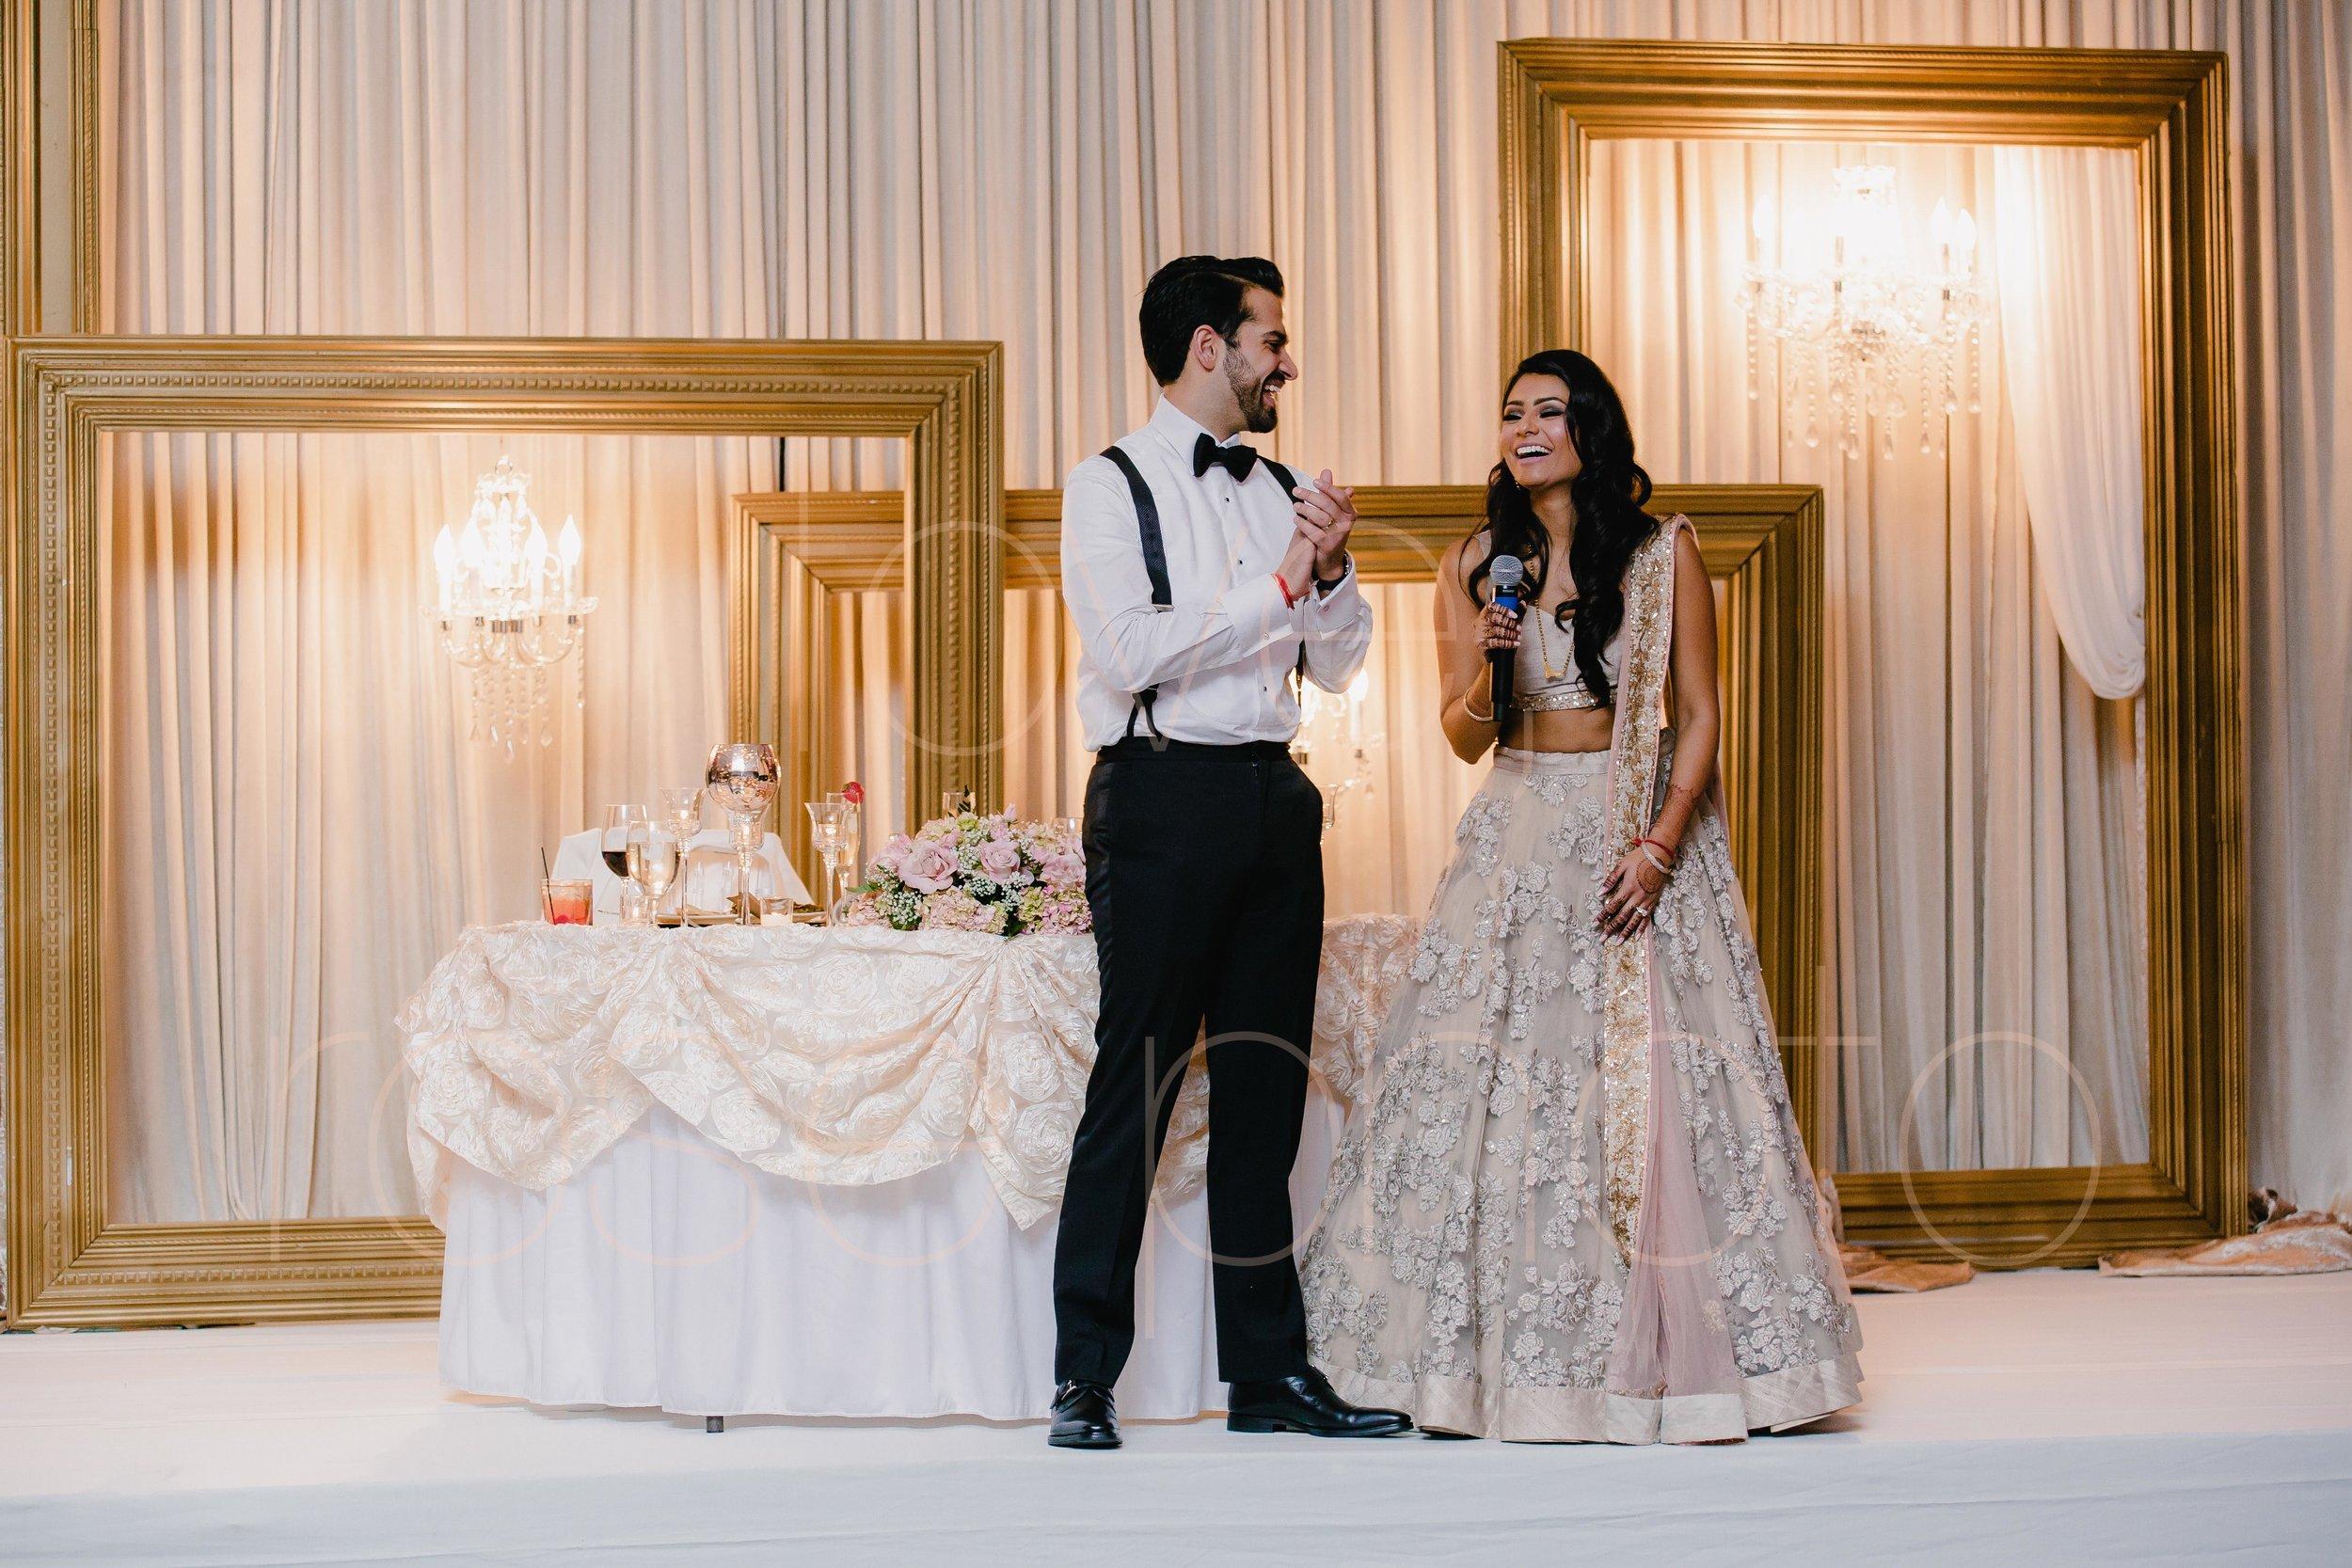 Chicago Indian Wedding best photography lifestyle wedding portrait luxury wedding-73.jpg